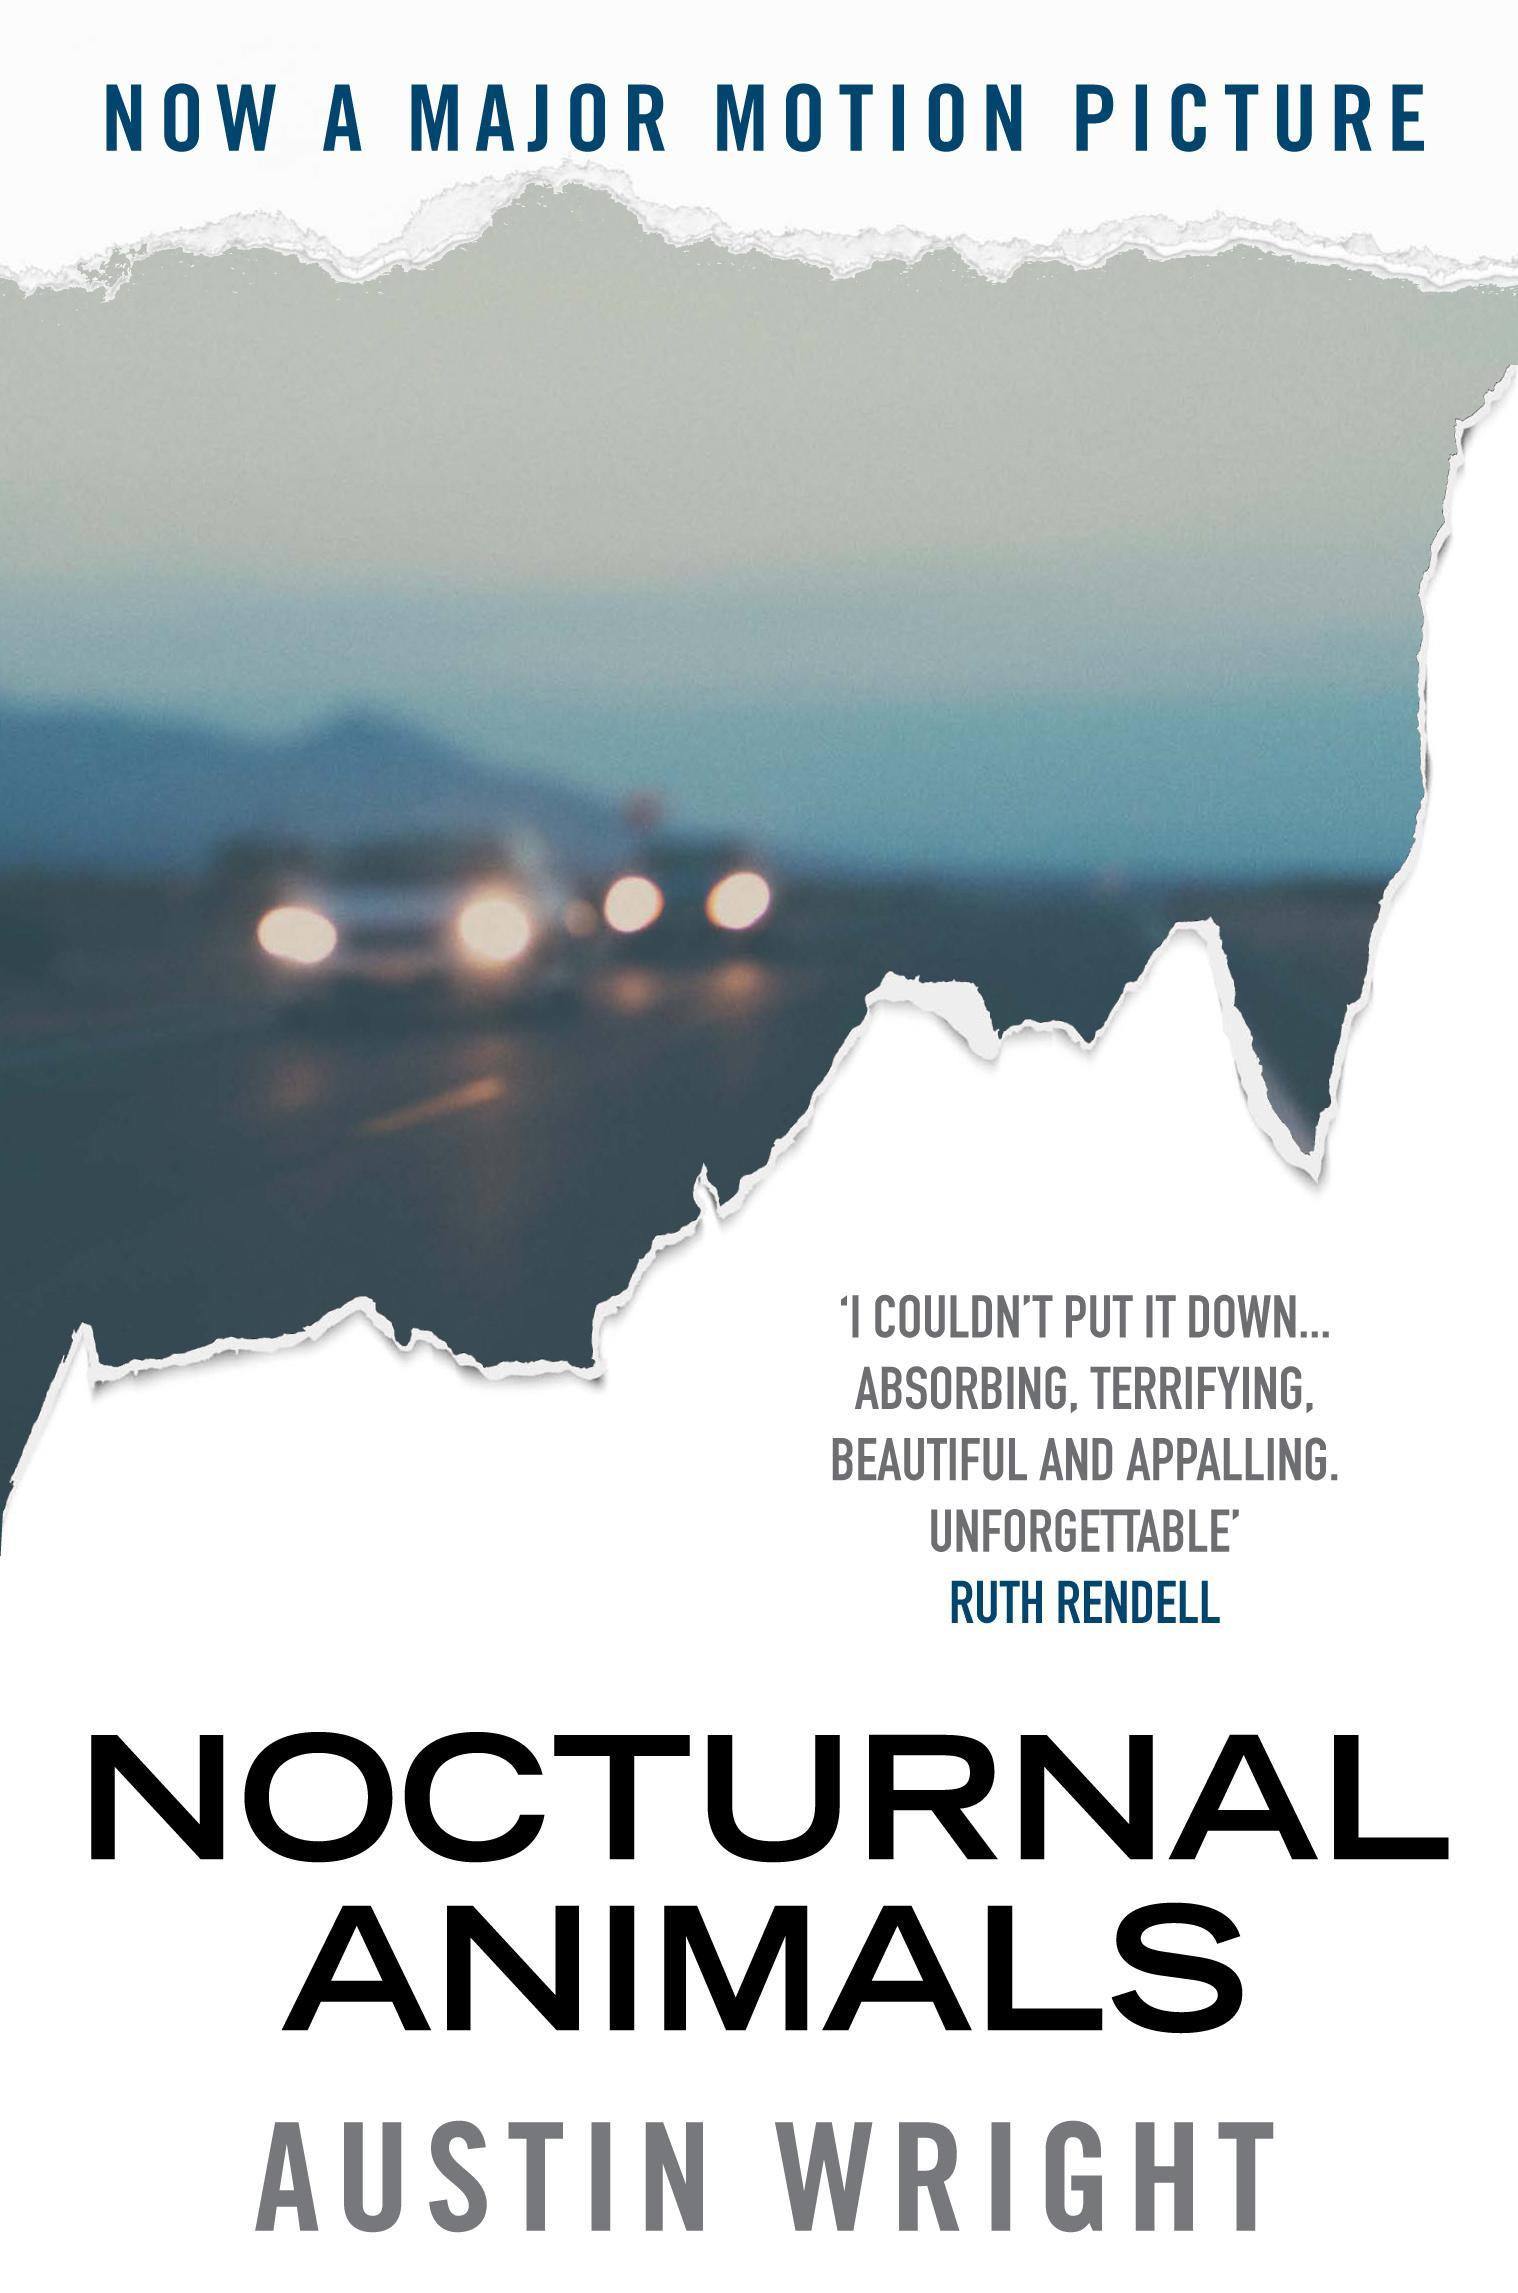 NocturnalAnimals